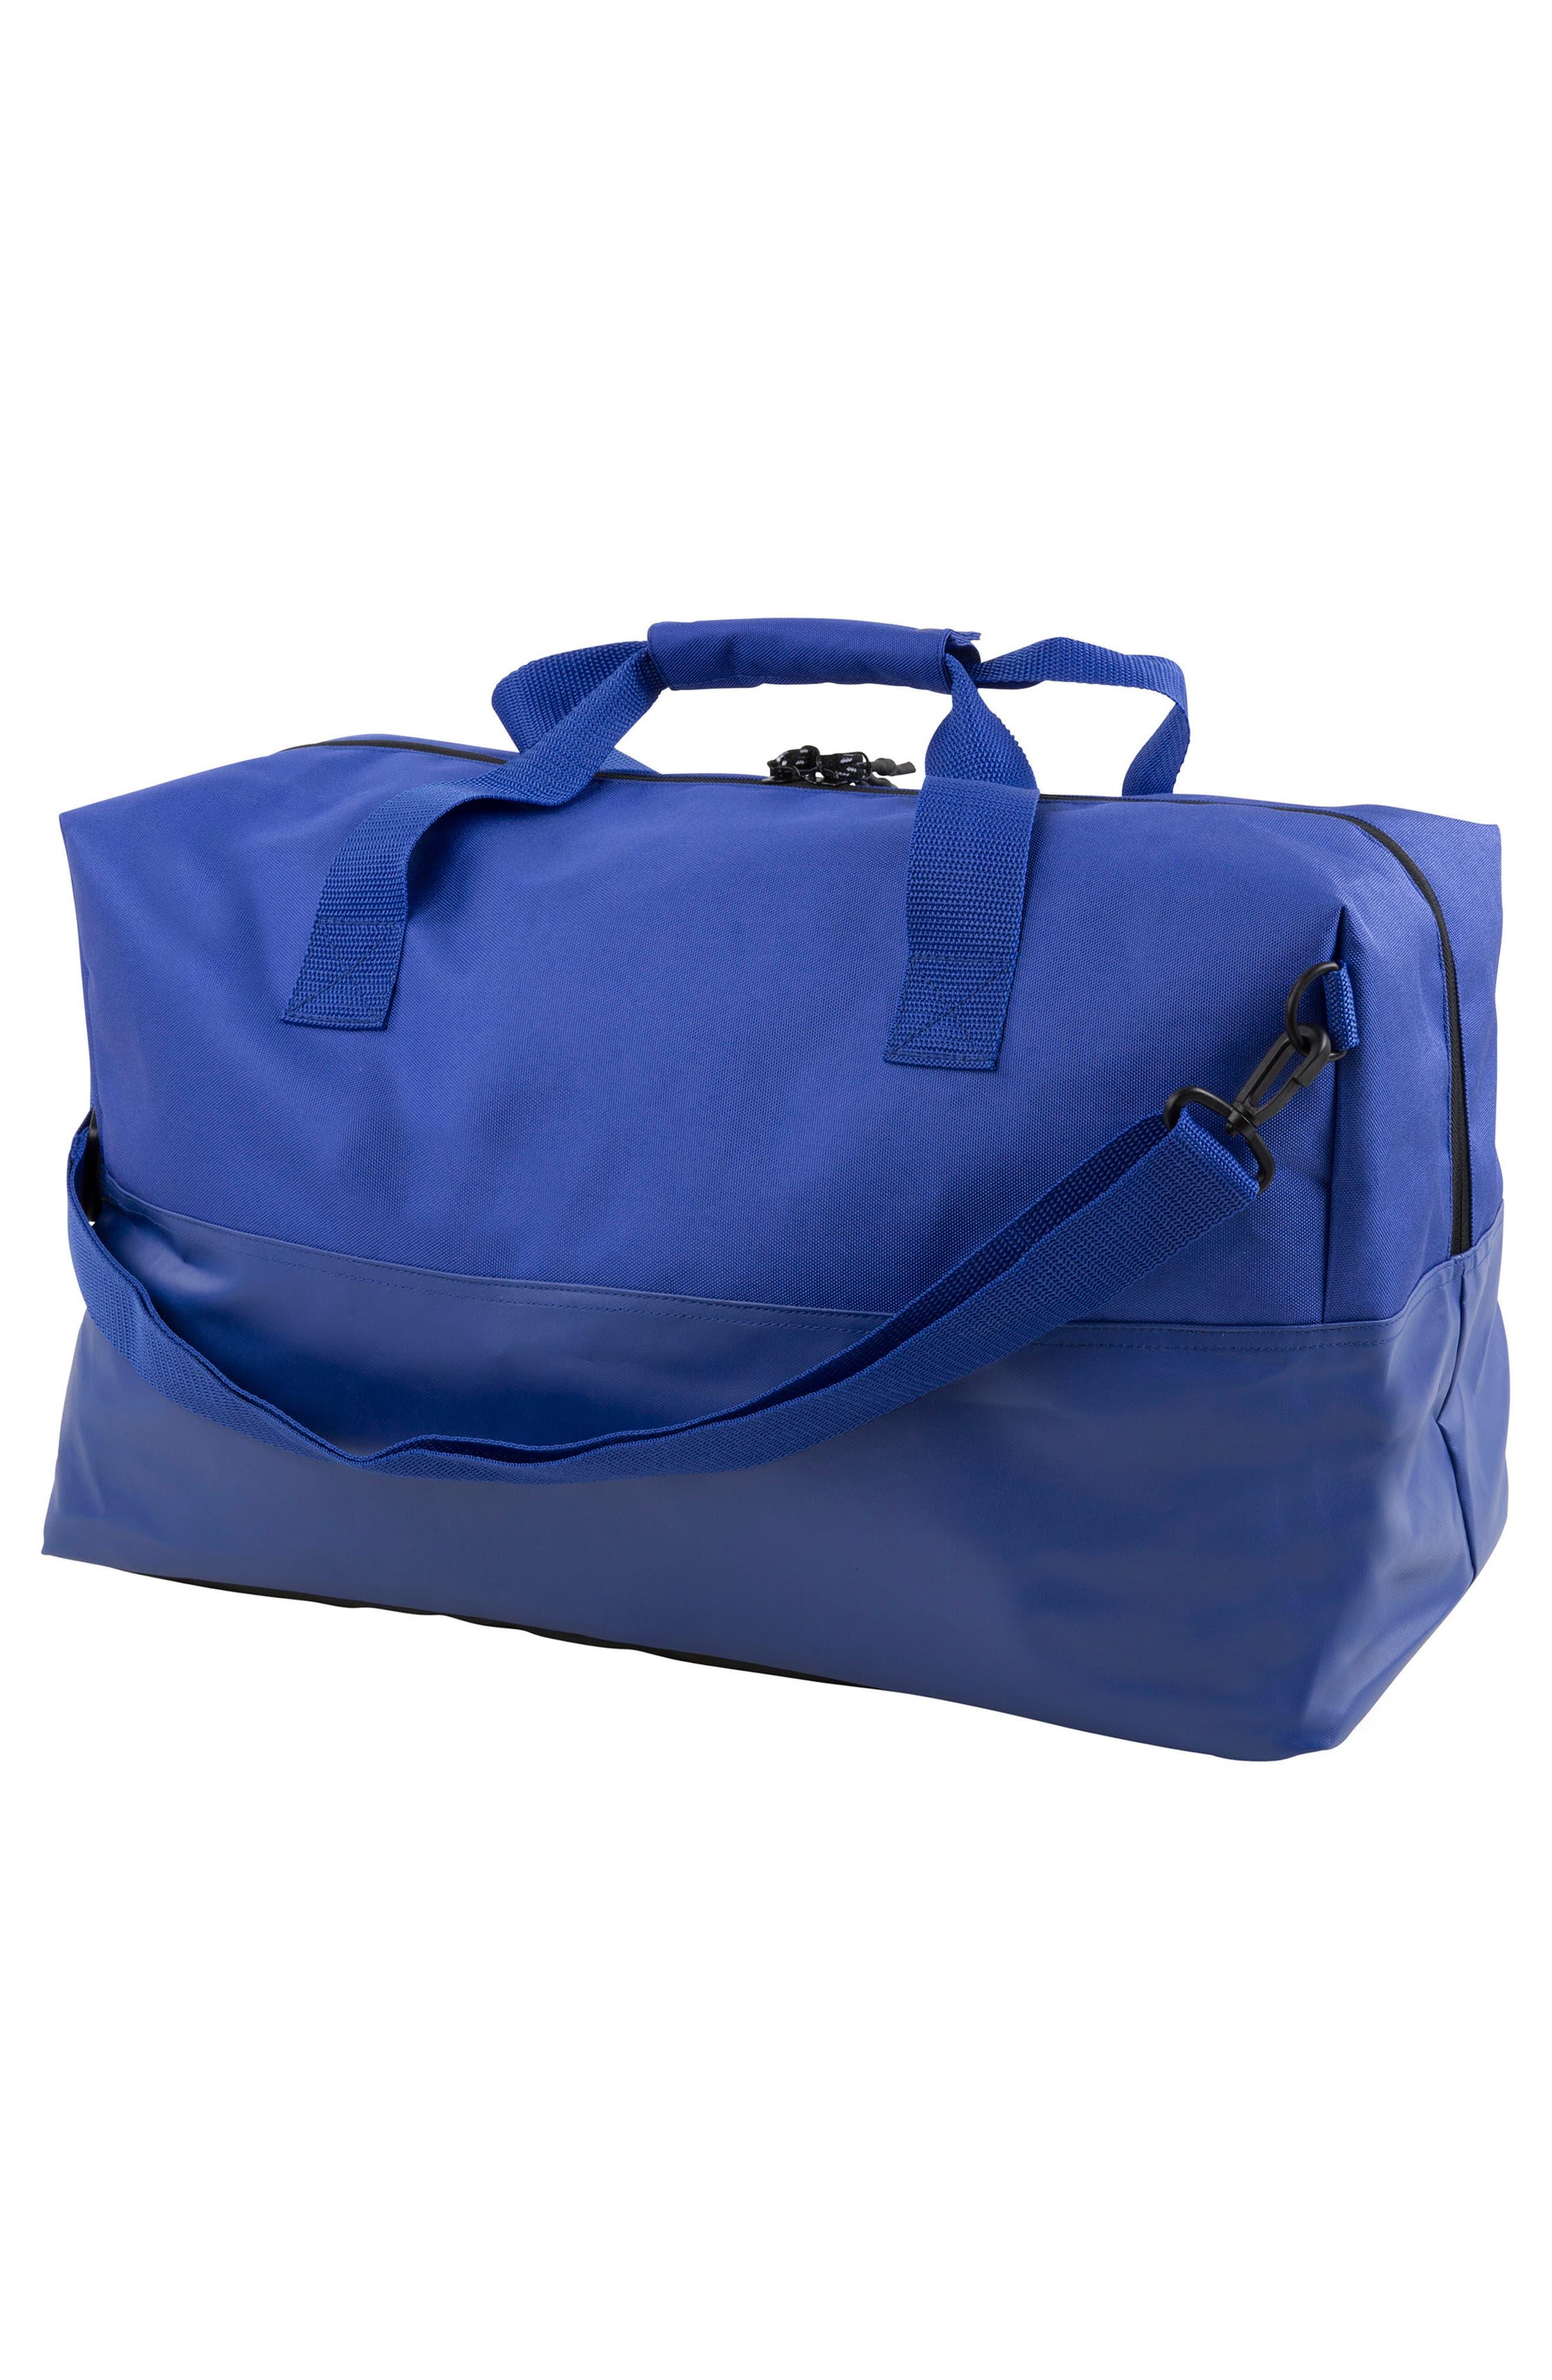 Alternate Image 2  - HEX Aspect Duffel Bag